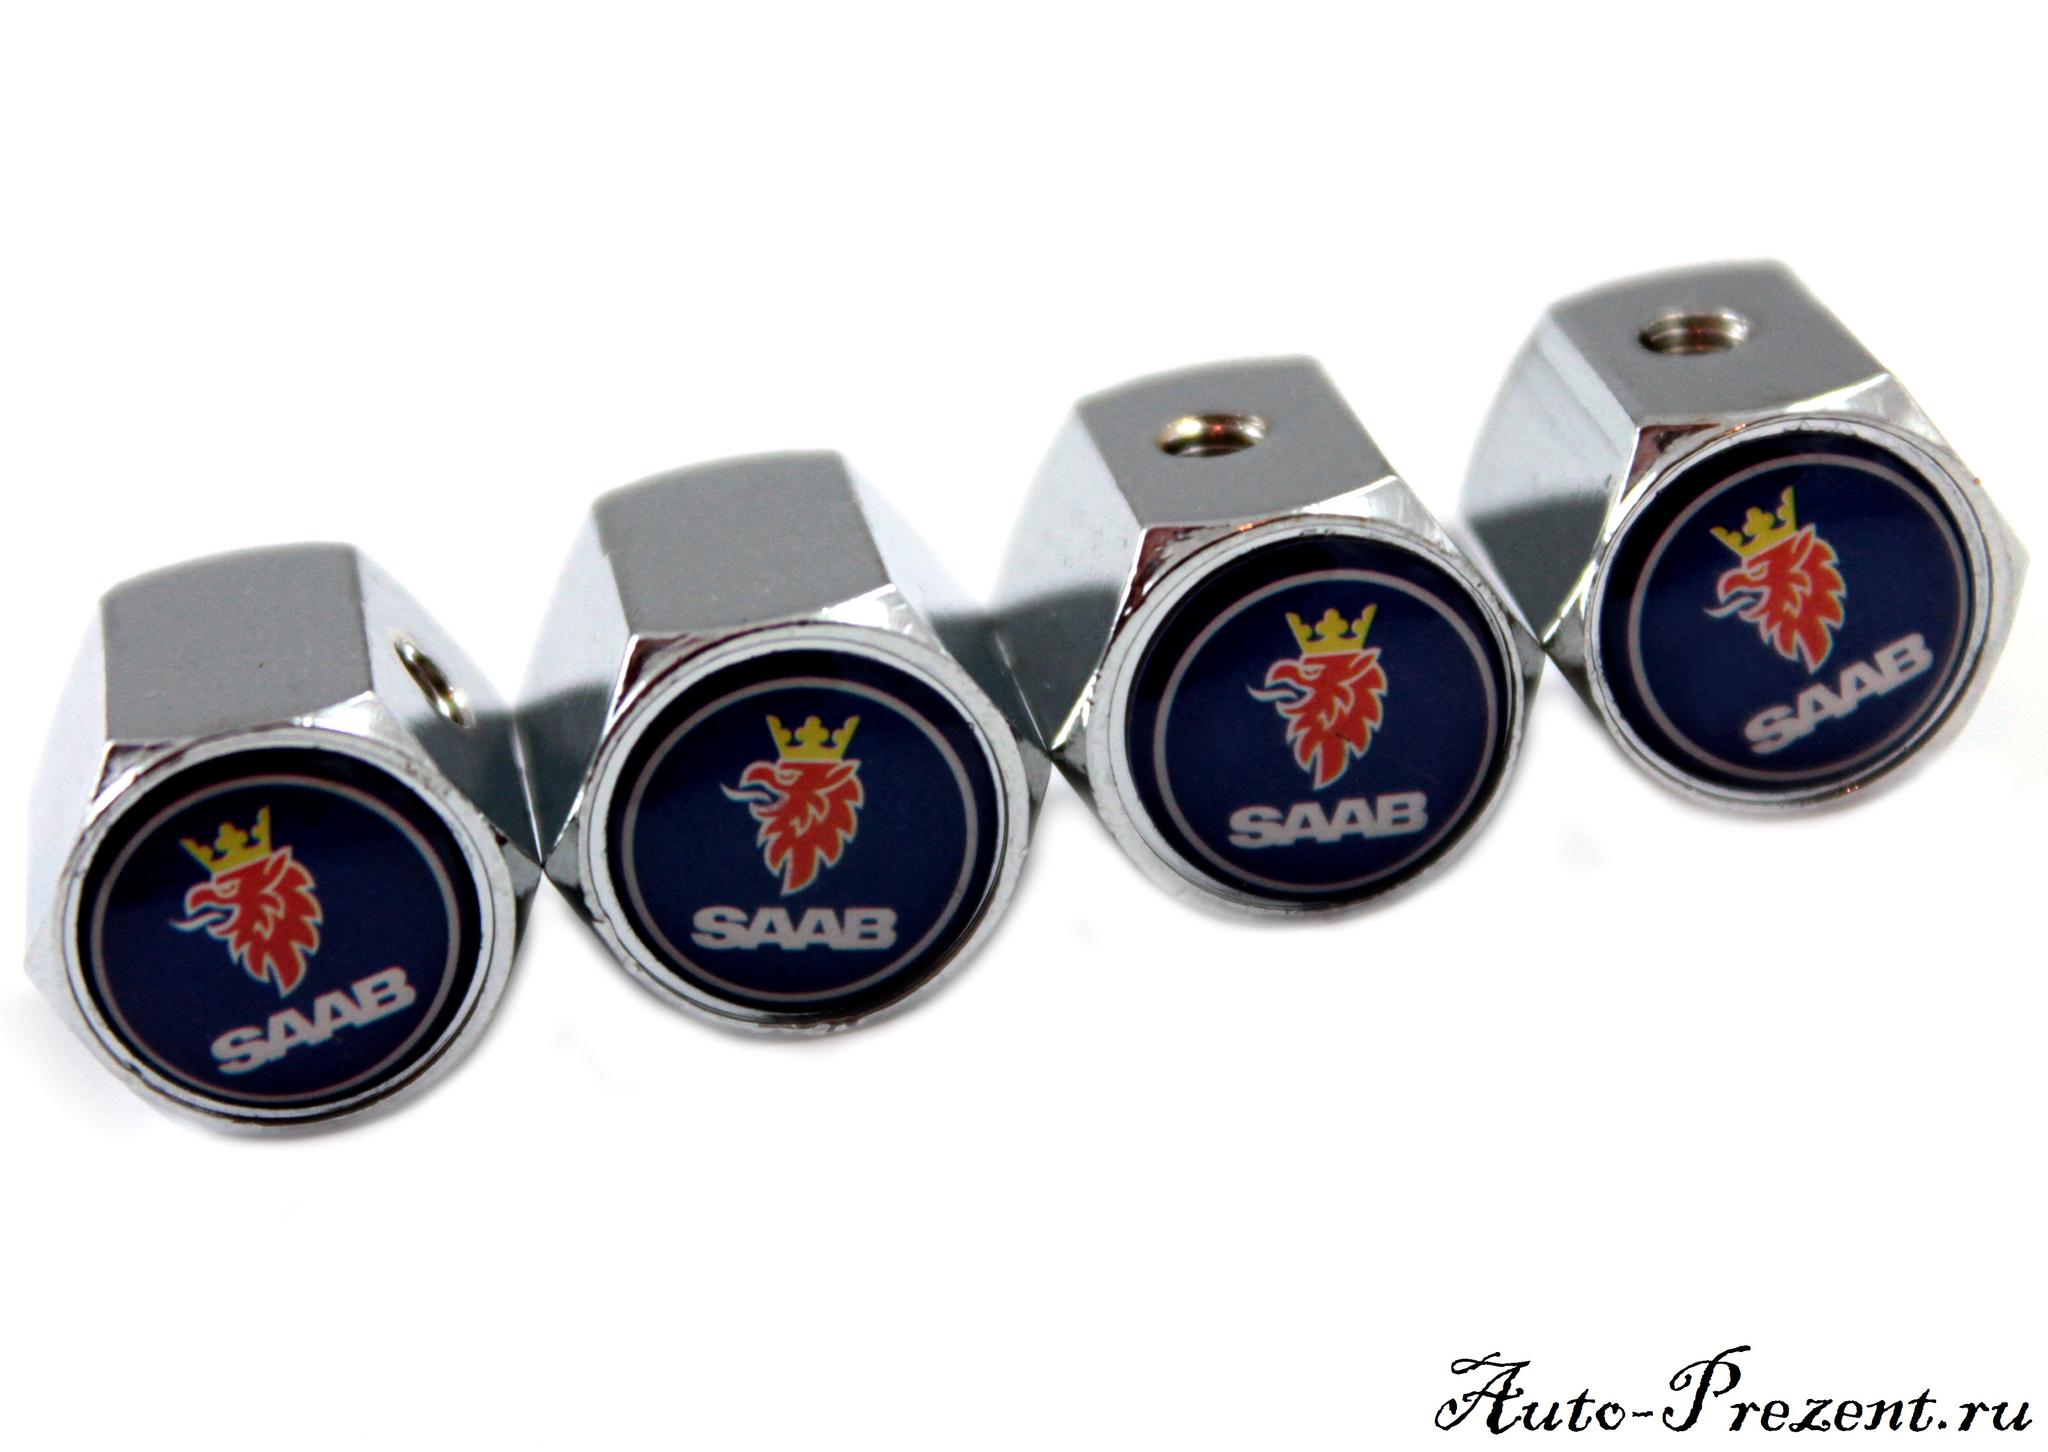 Колпачки на ниппель SAAB с защитой от кражи